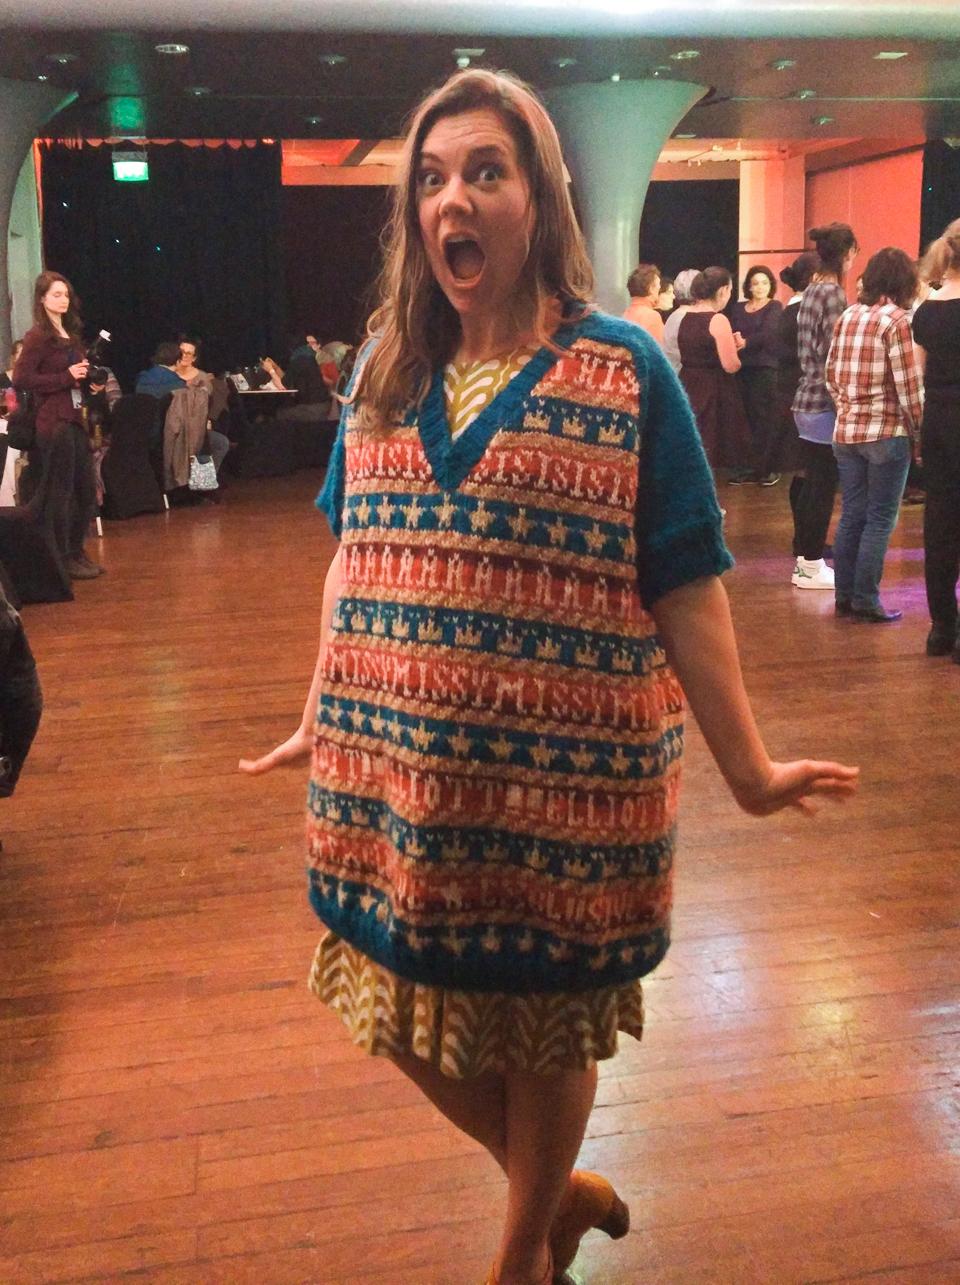 Ysolda sporting the Missy Elliott sweater on Friday night!